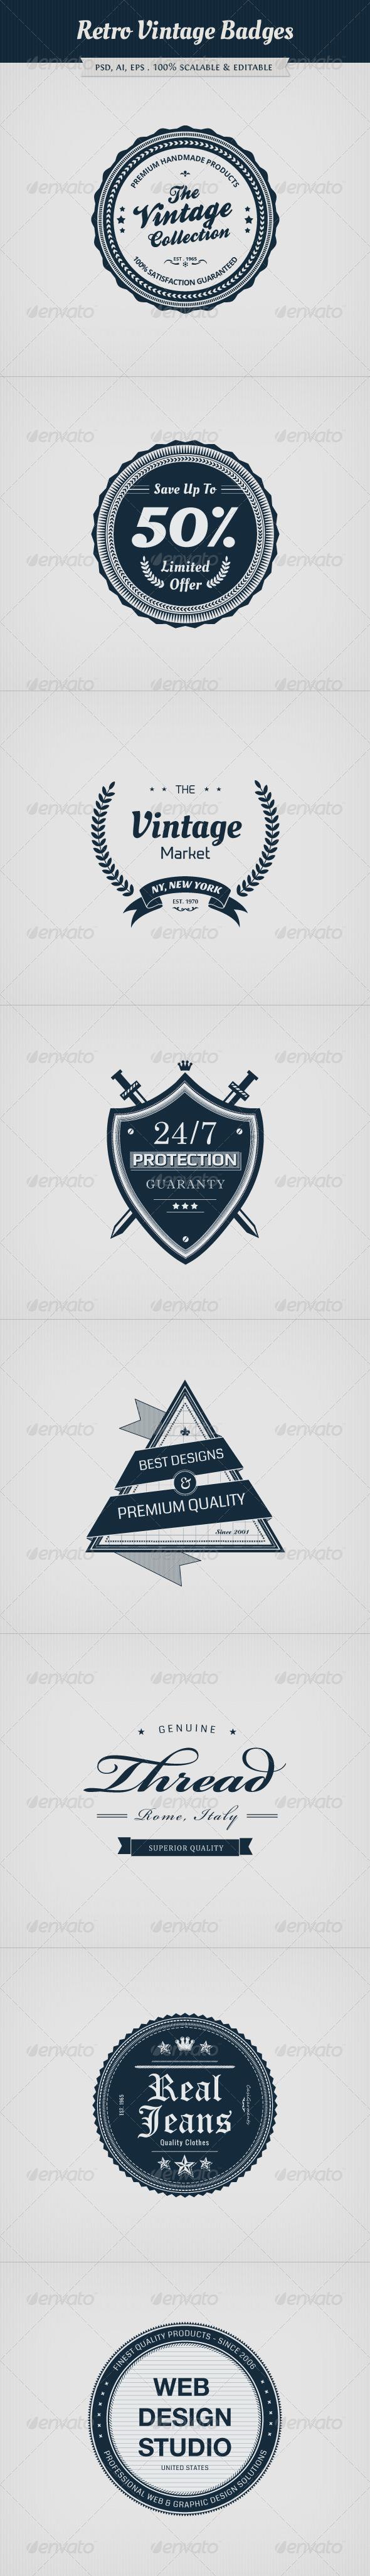 GraphicRiver Retro Vintage Badges 4802197